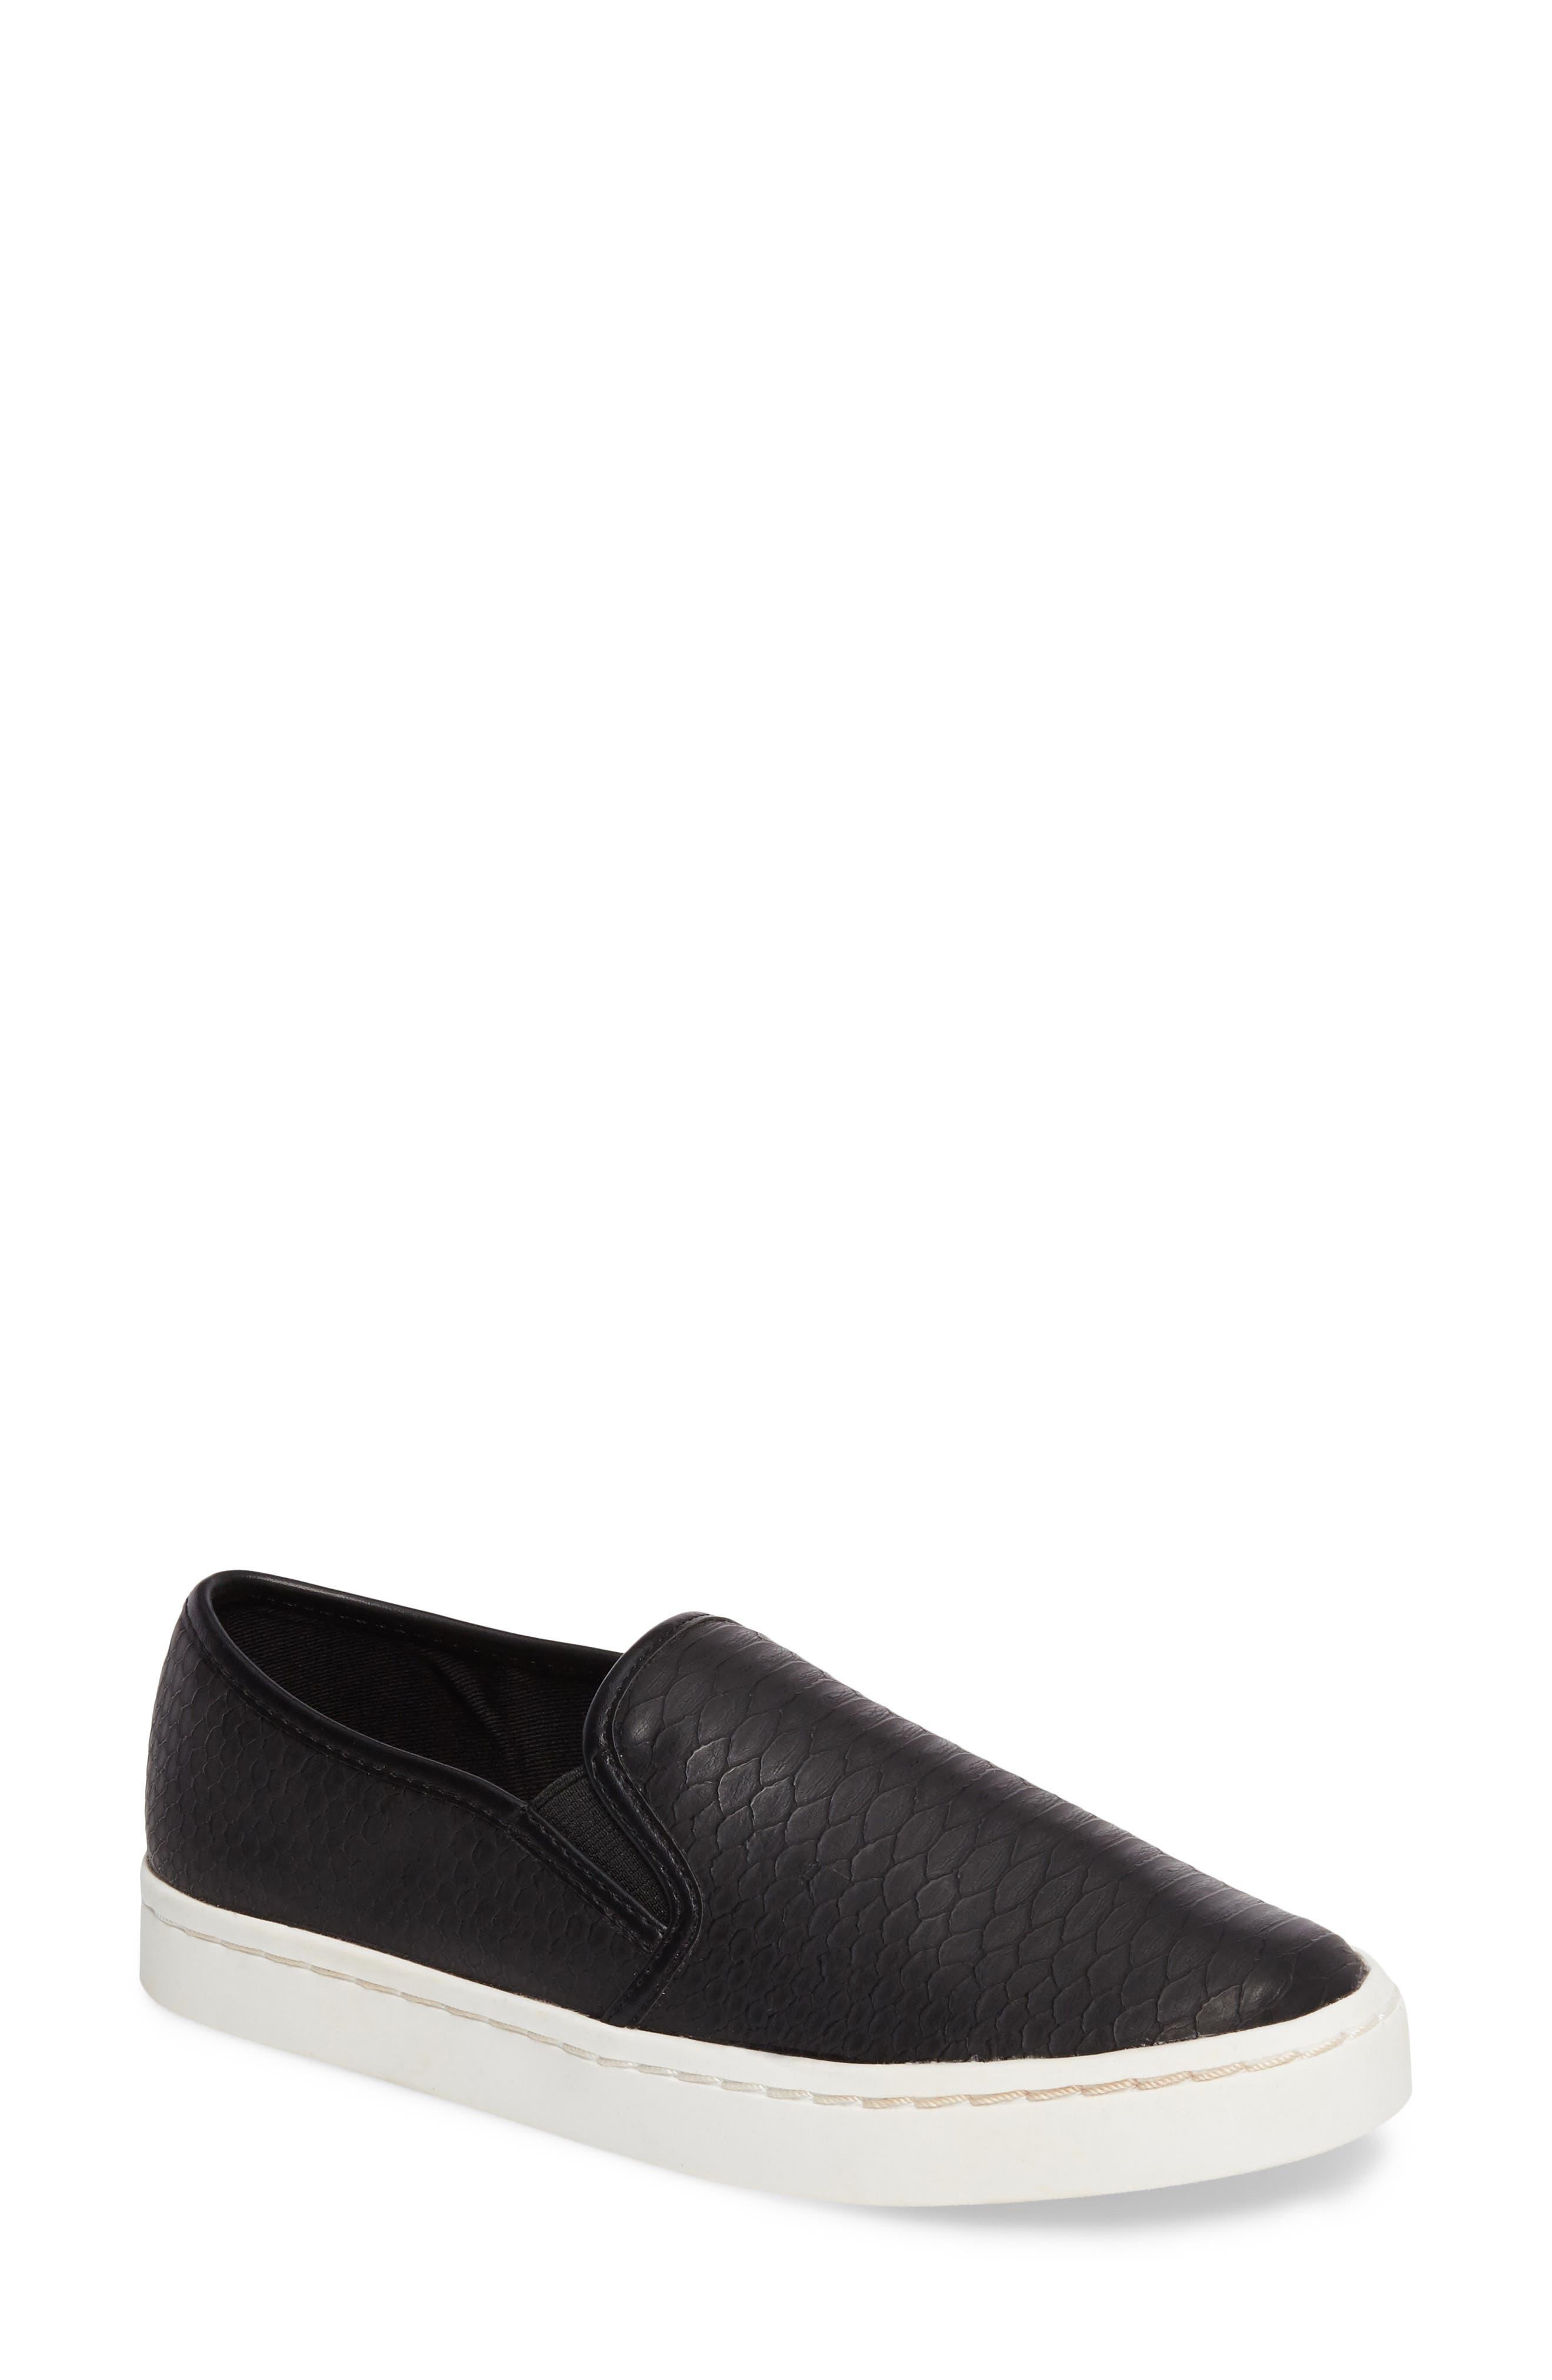 'Twiny' Slip-On Sneaker,                             Main thumbnail 1, color,                             005